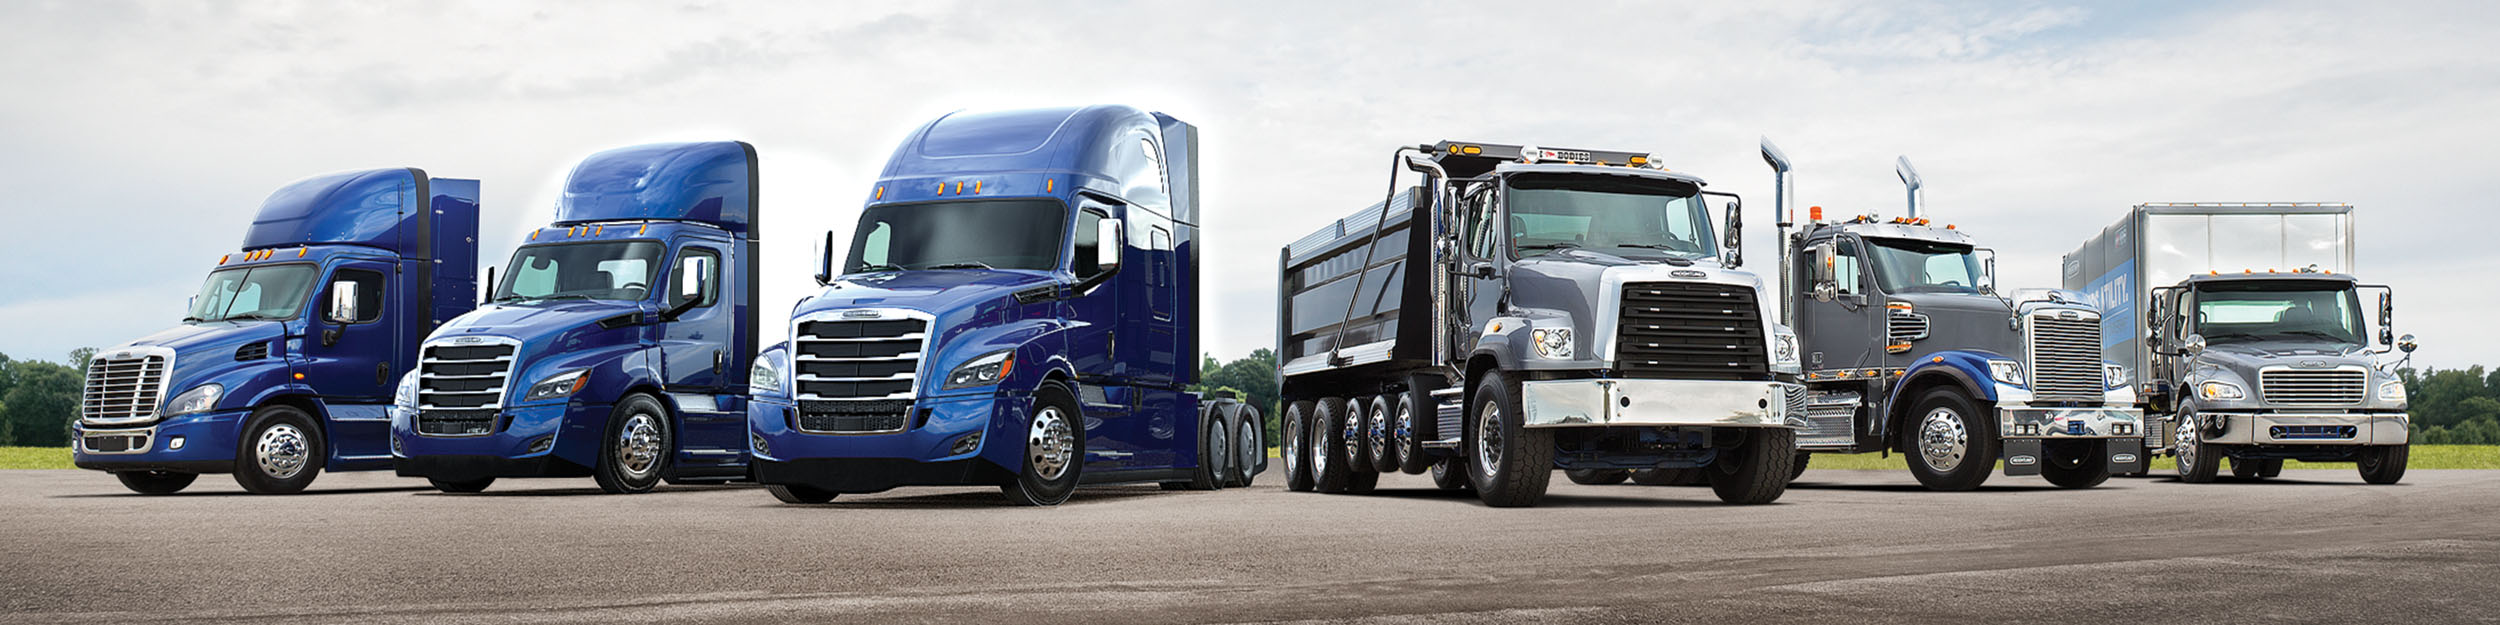 Truck transmission repairs